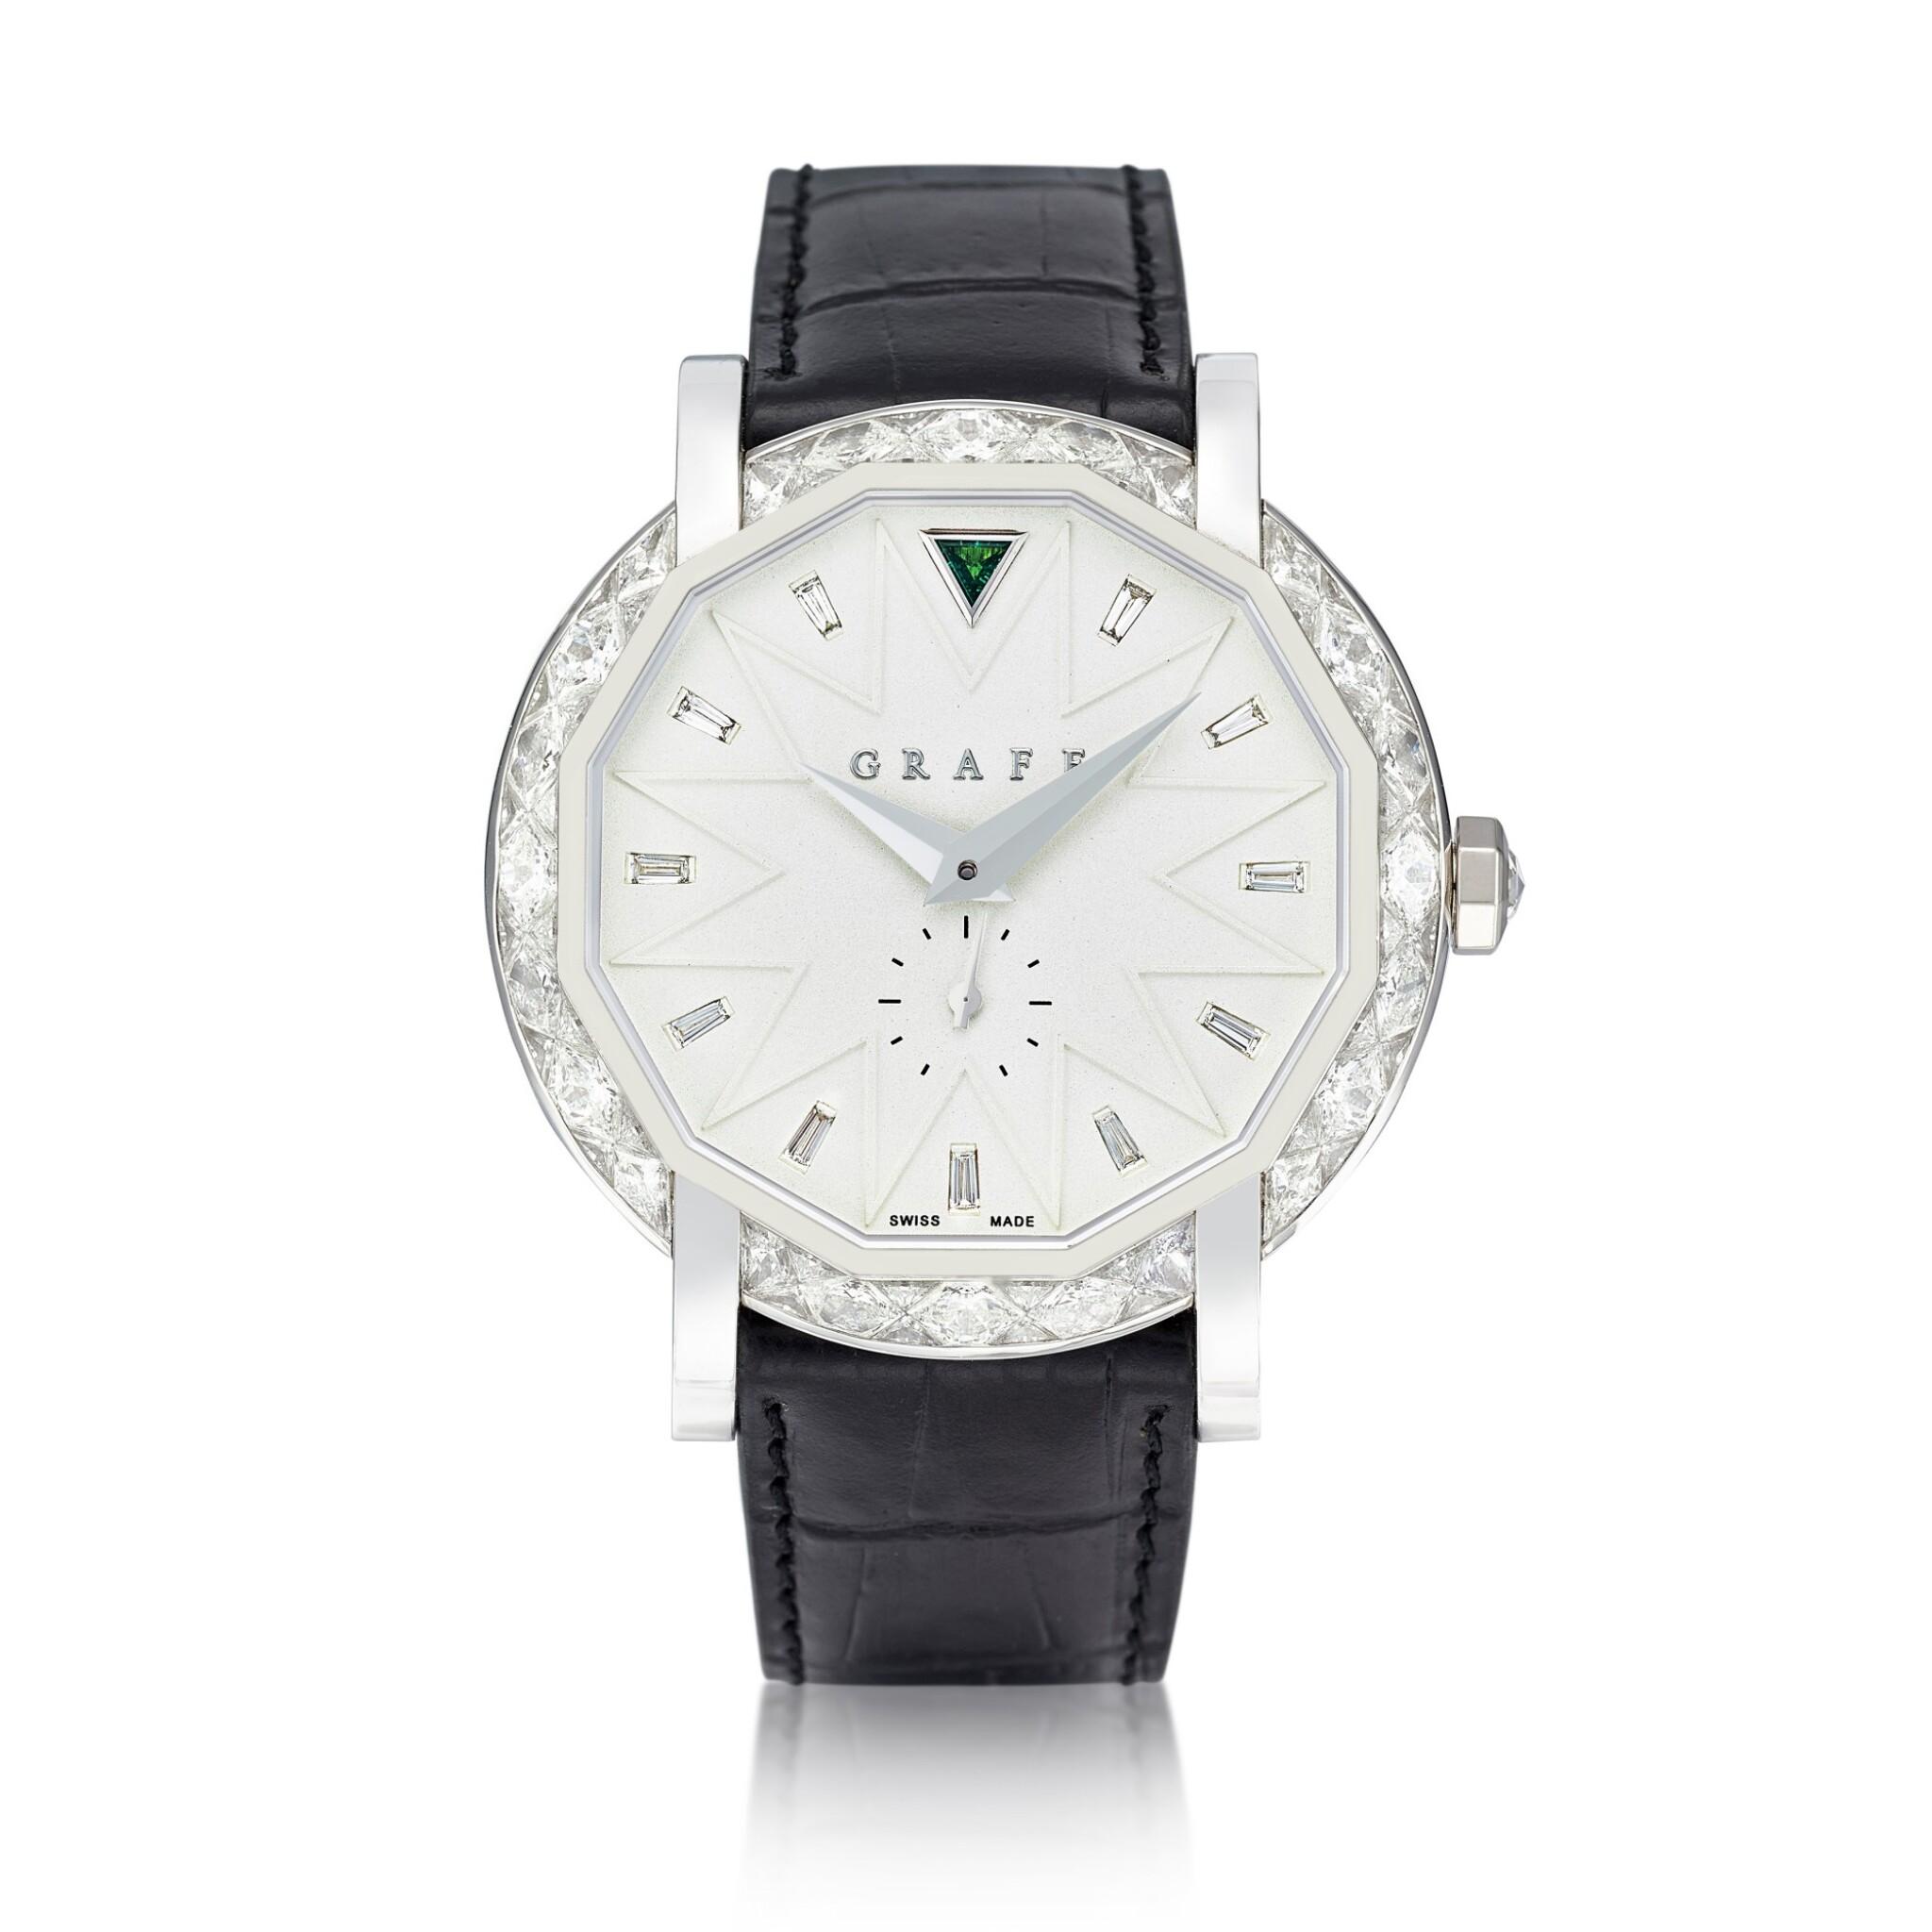 View full screen - View 1 of Lot 1842. 'GraffStar' Limited Edition Diamond and Emerald Wristwatch with Date   格拉夫   'GraffStar' 限量版鑽石 配 祖母綠 自動上鏈腕錶,附日期顯示.